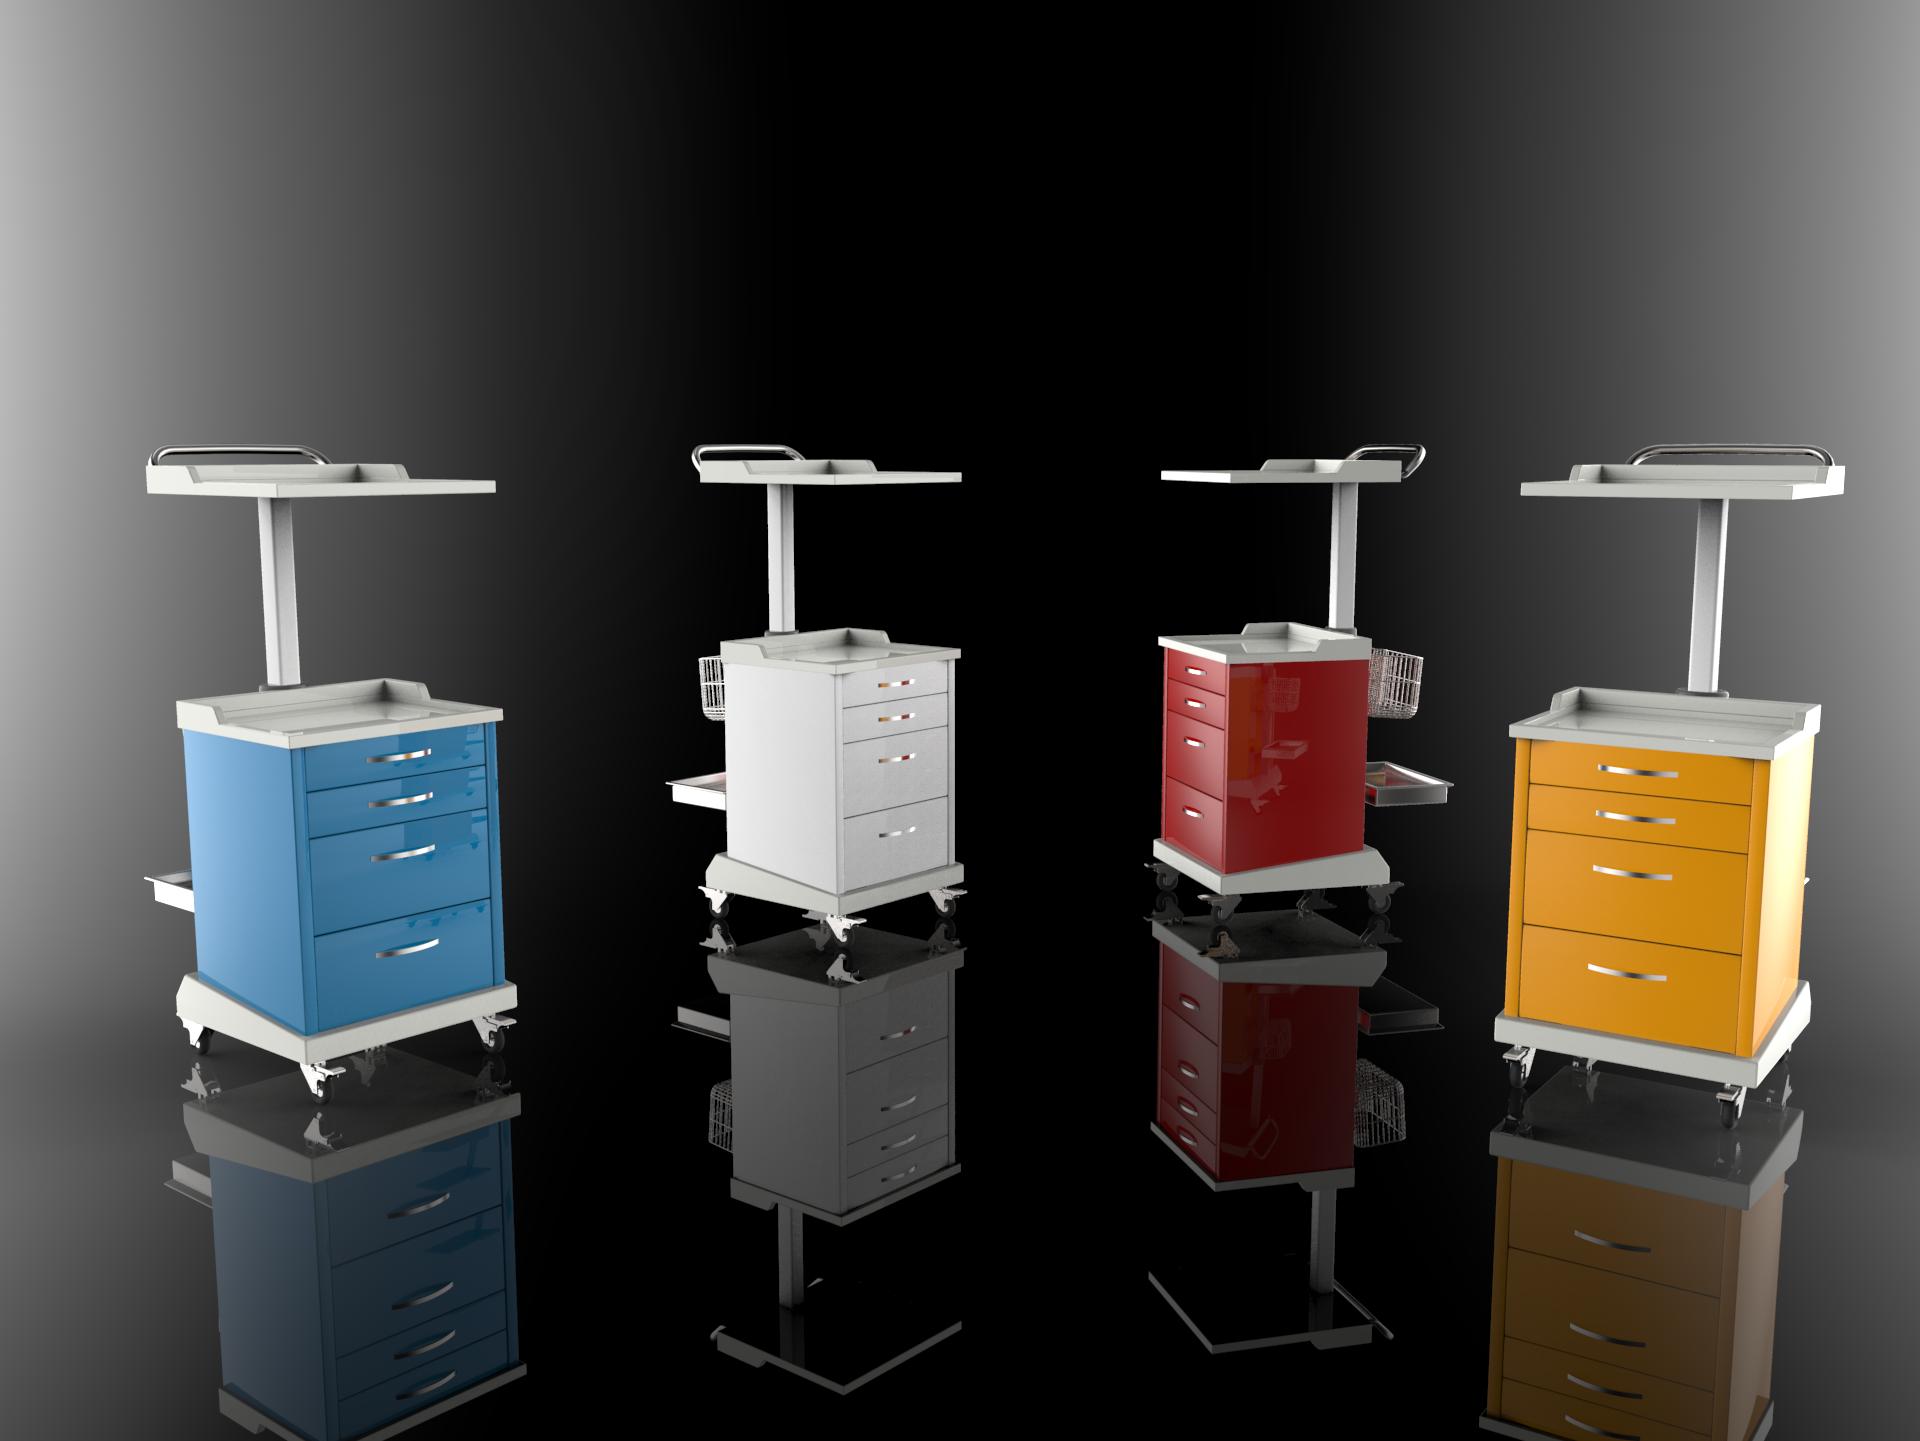 Multipurpose Mobile Cabinet Dental Cabinet Cabinet Tool Cabinet